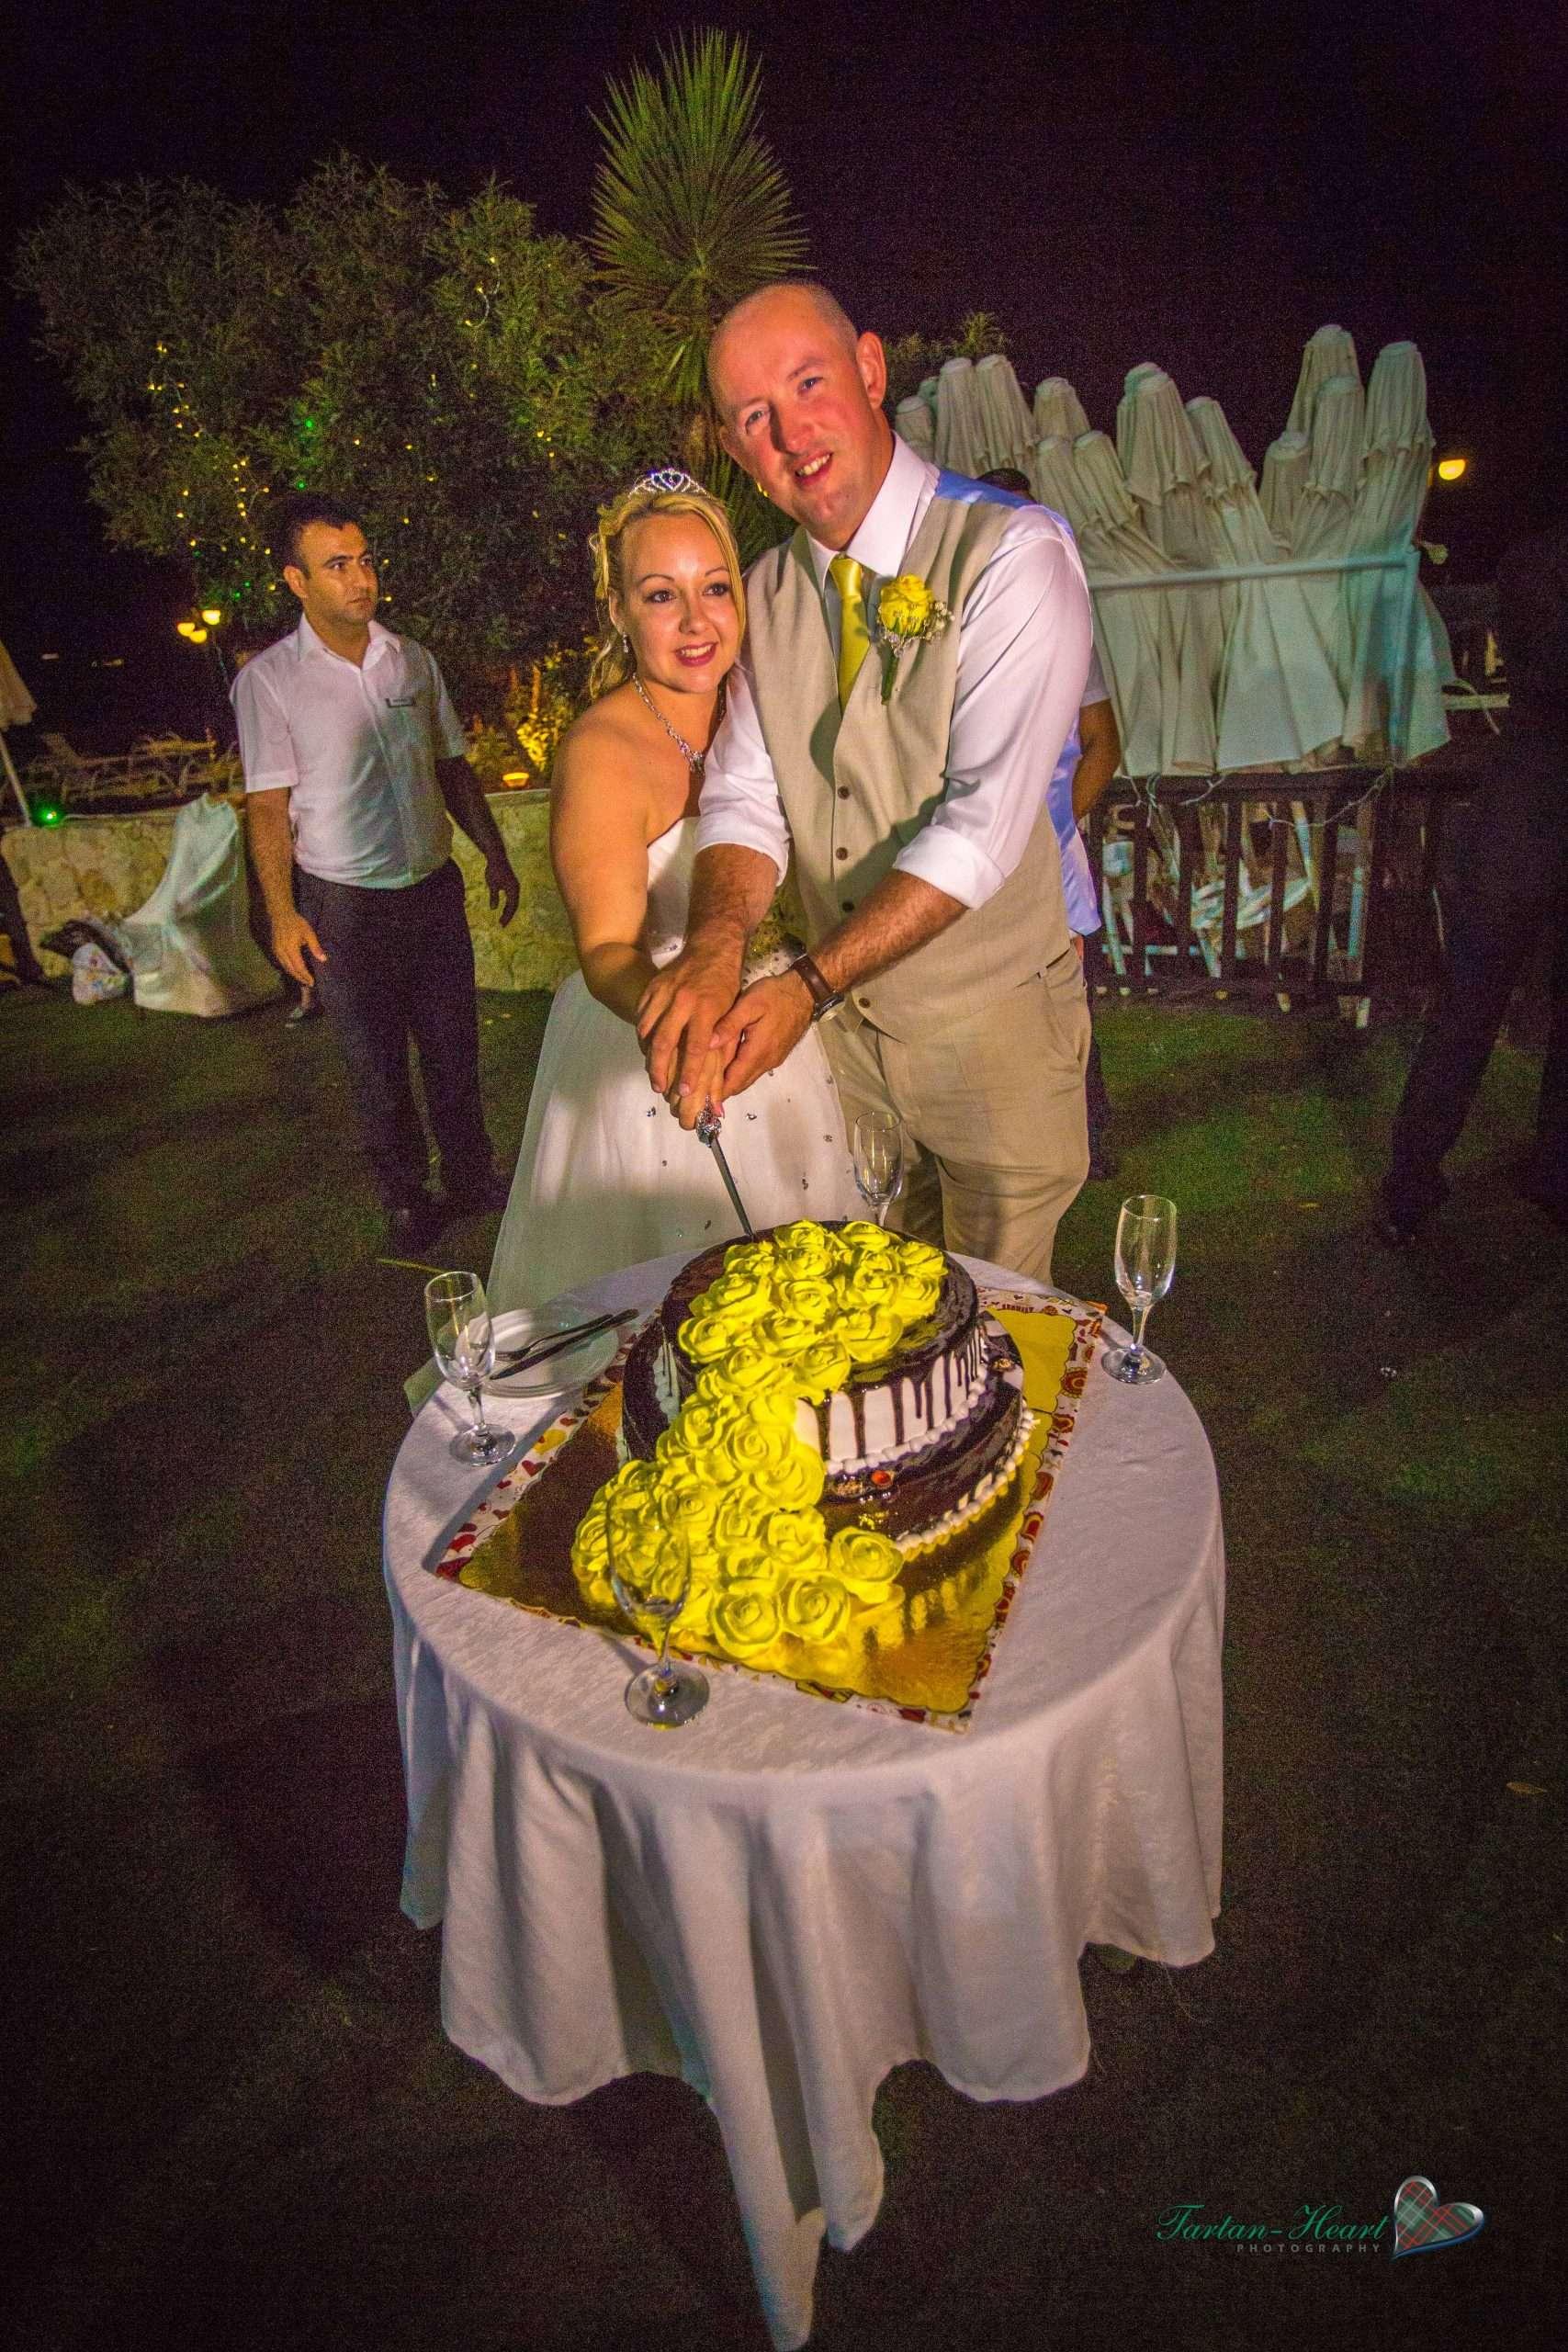 Cakes weddings in north cyprus